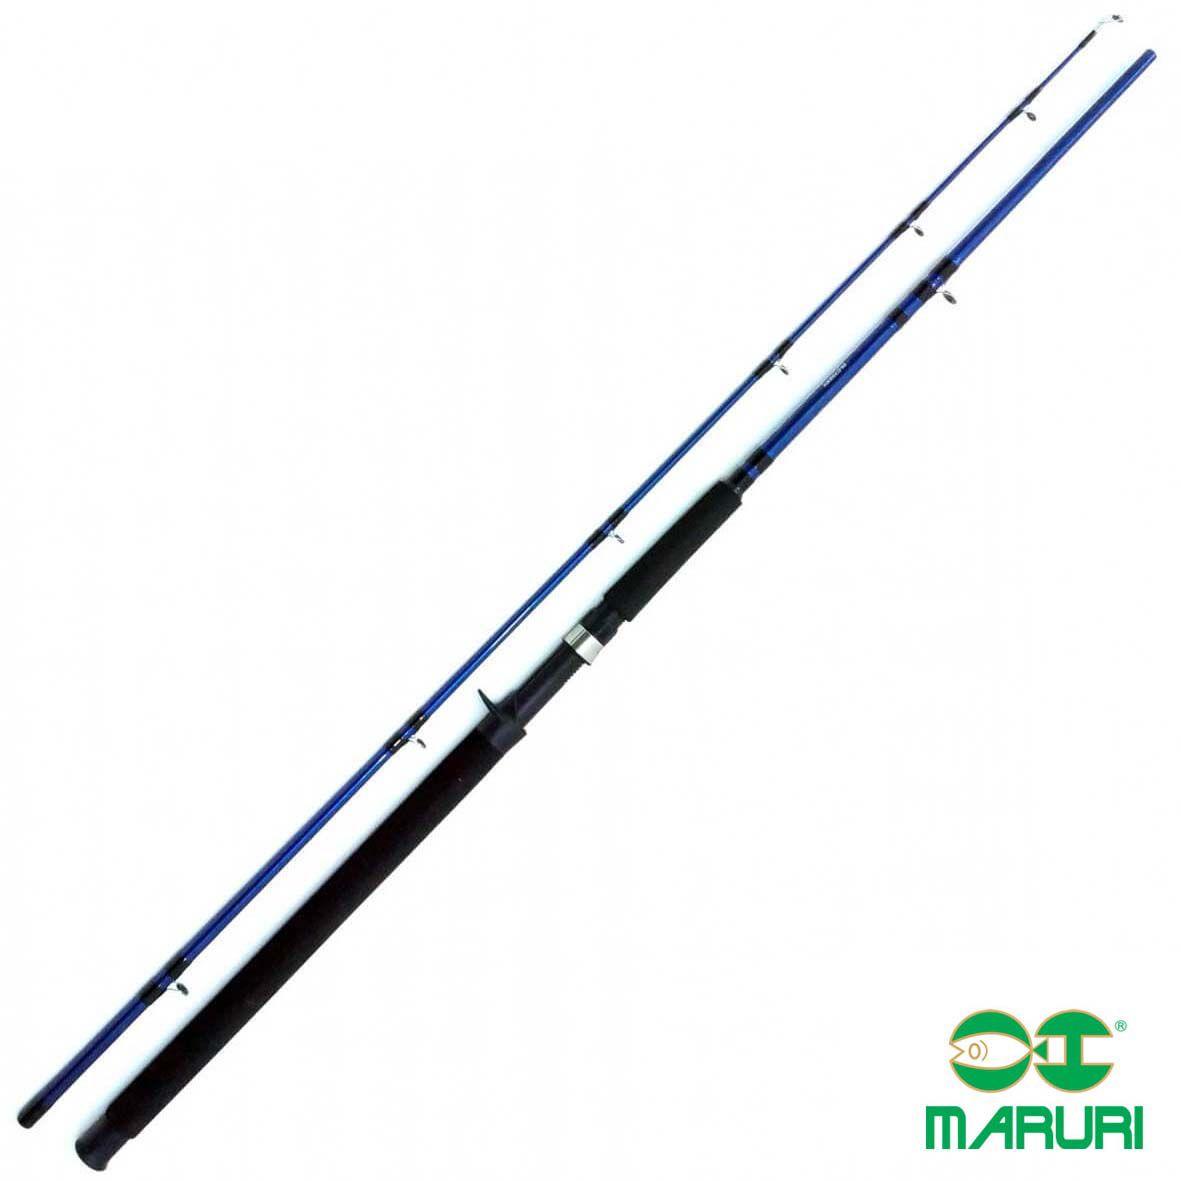 Vara p/ Carretilha Maruri Pira 6'0'' 80 lbs (2p)